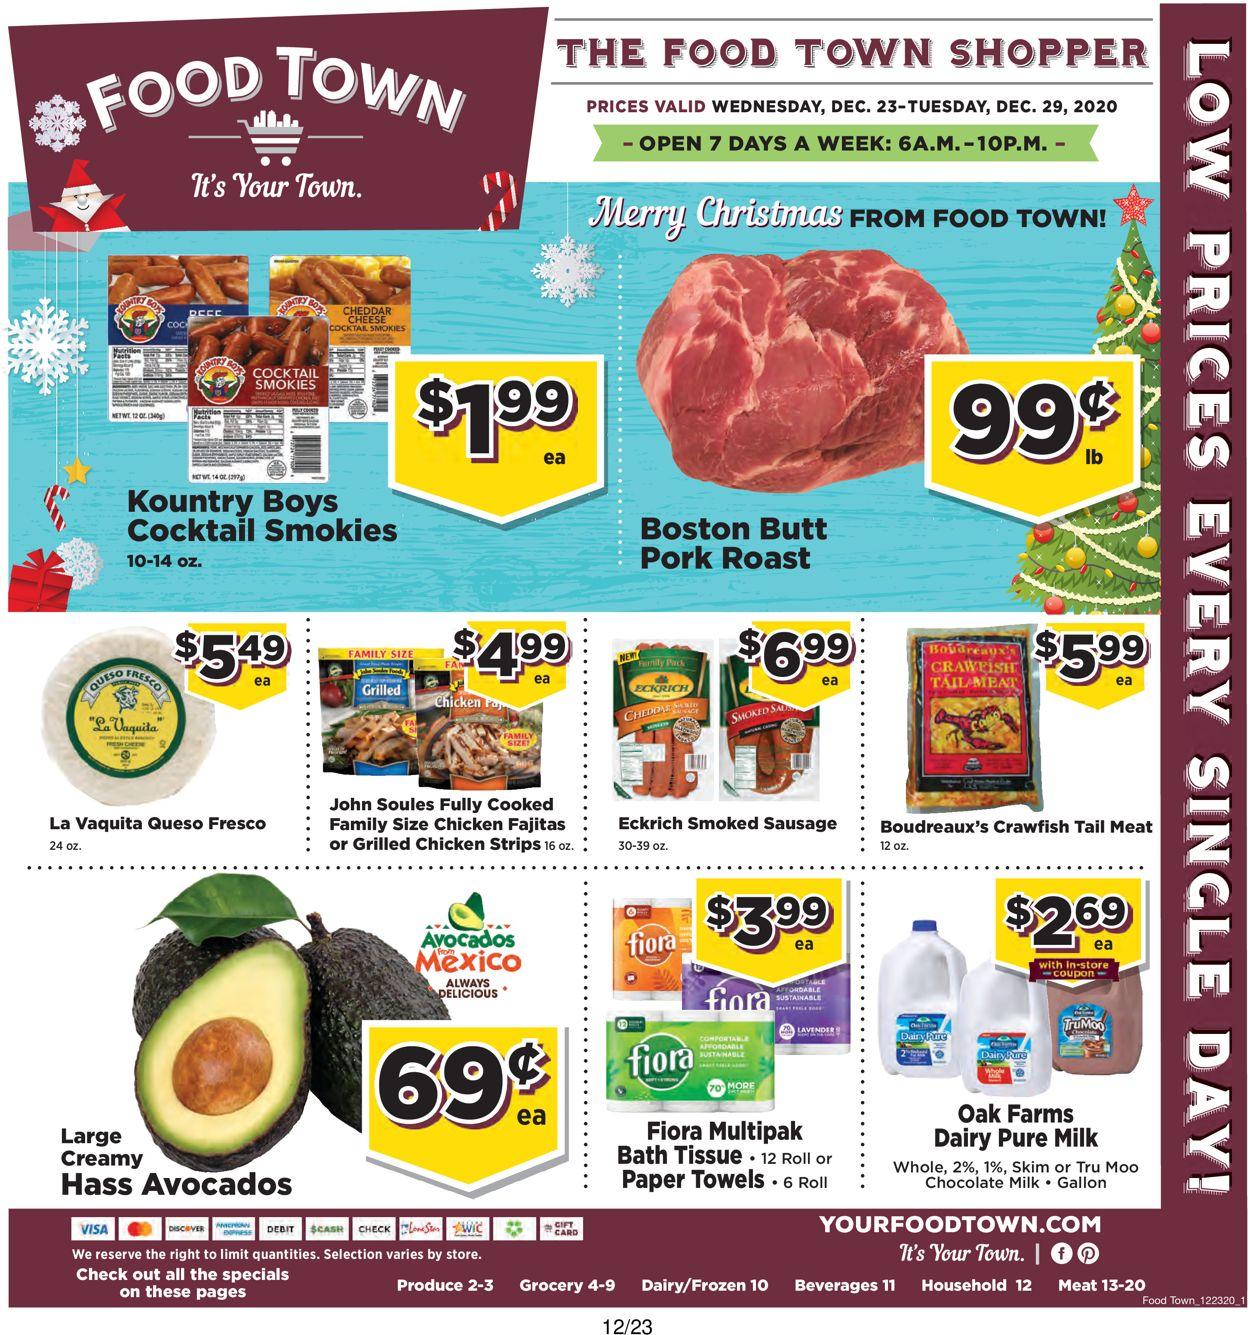 Food Town Christmas 2020 Weekly Ad Circular - valid 12/23-12/29/2020